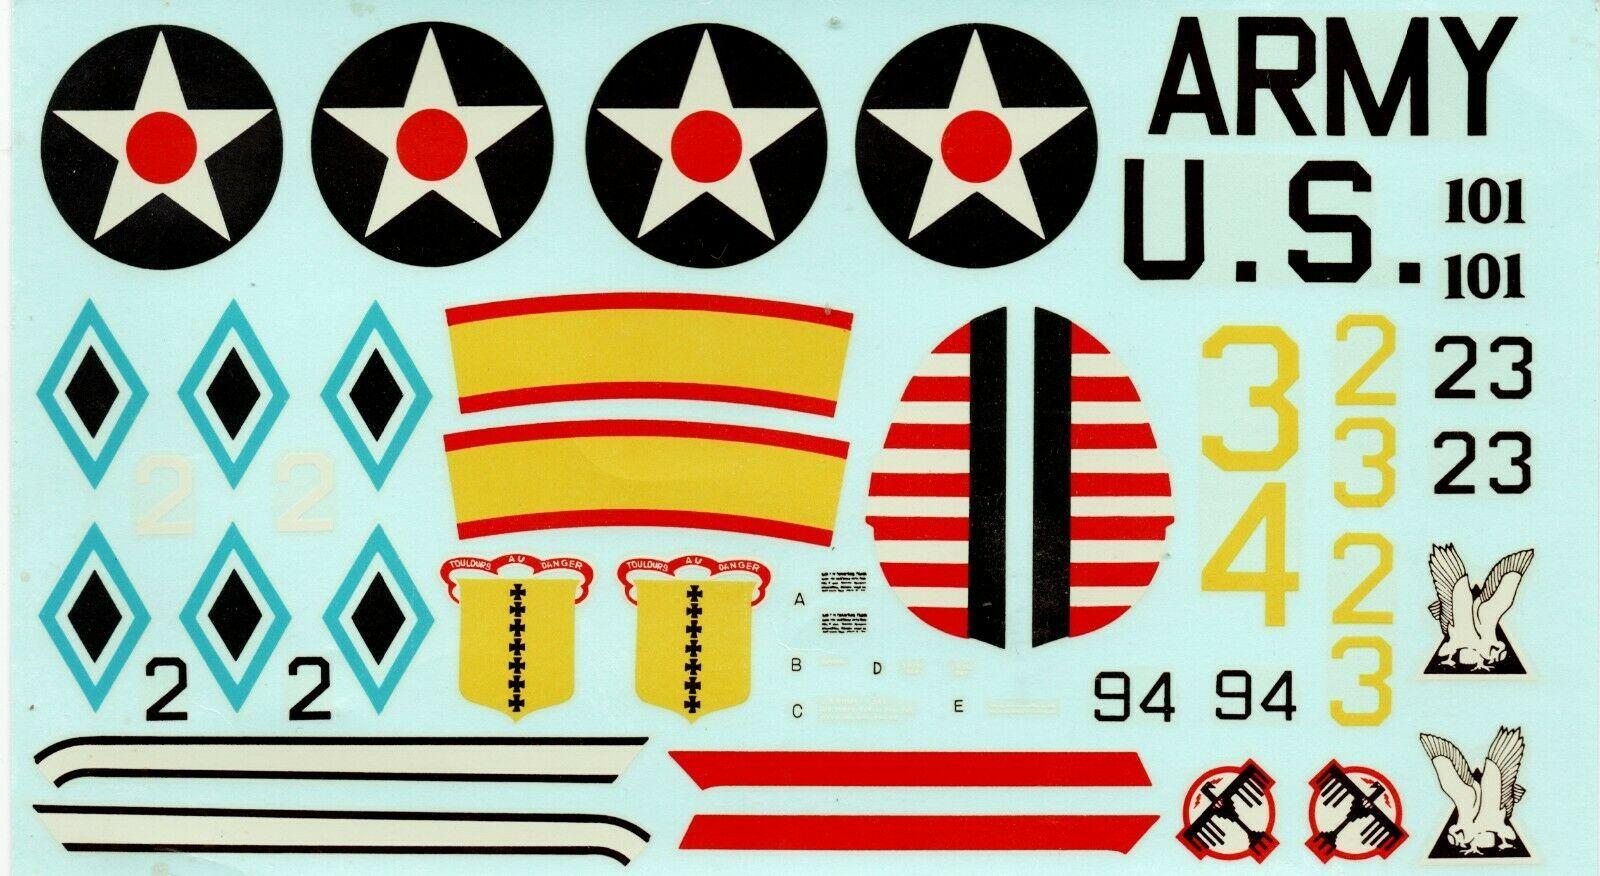 GENUINE HASEGAWA OEM 1/32 P26A PEASHOOTER DECALS US ARMY VINTAGE Made in Japan - $14.99